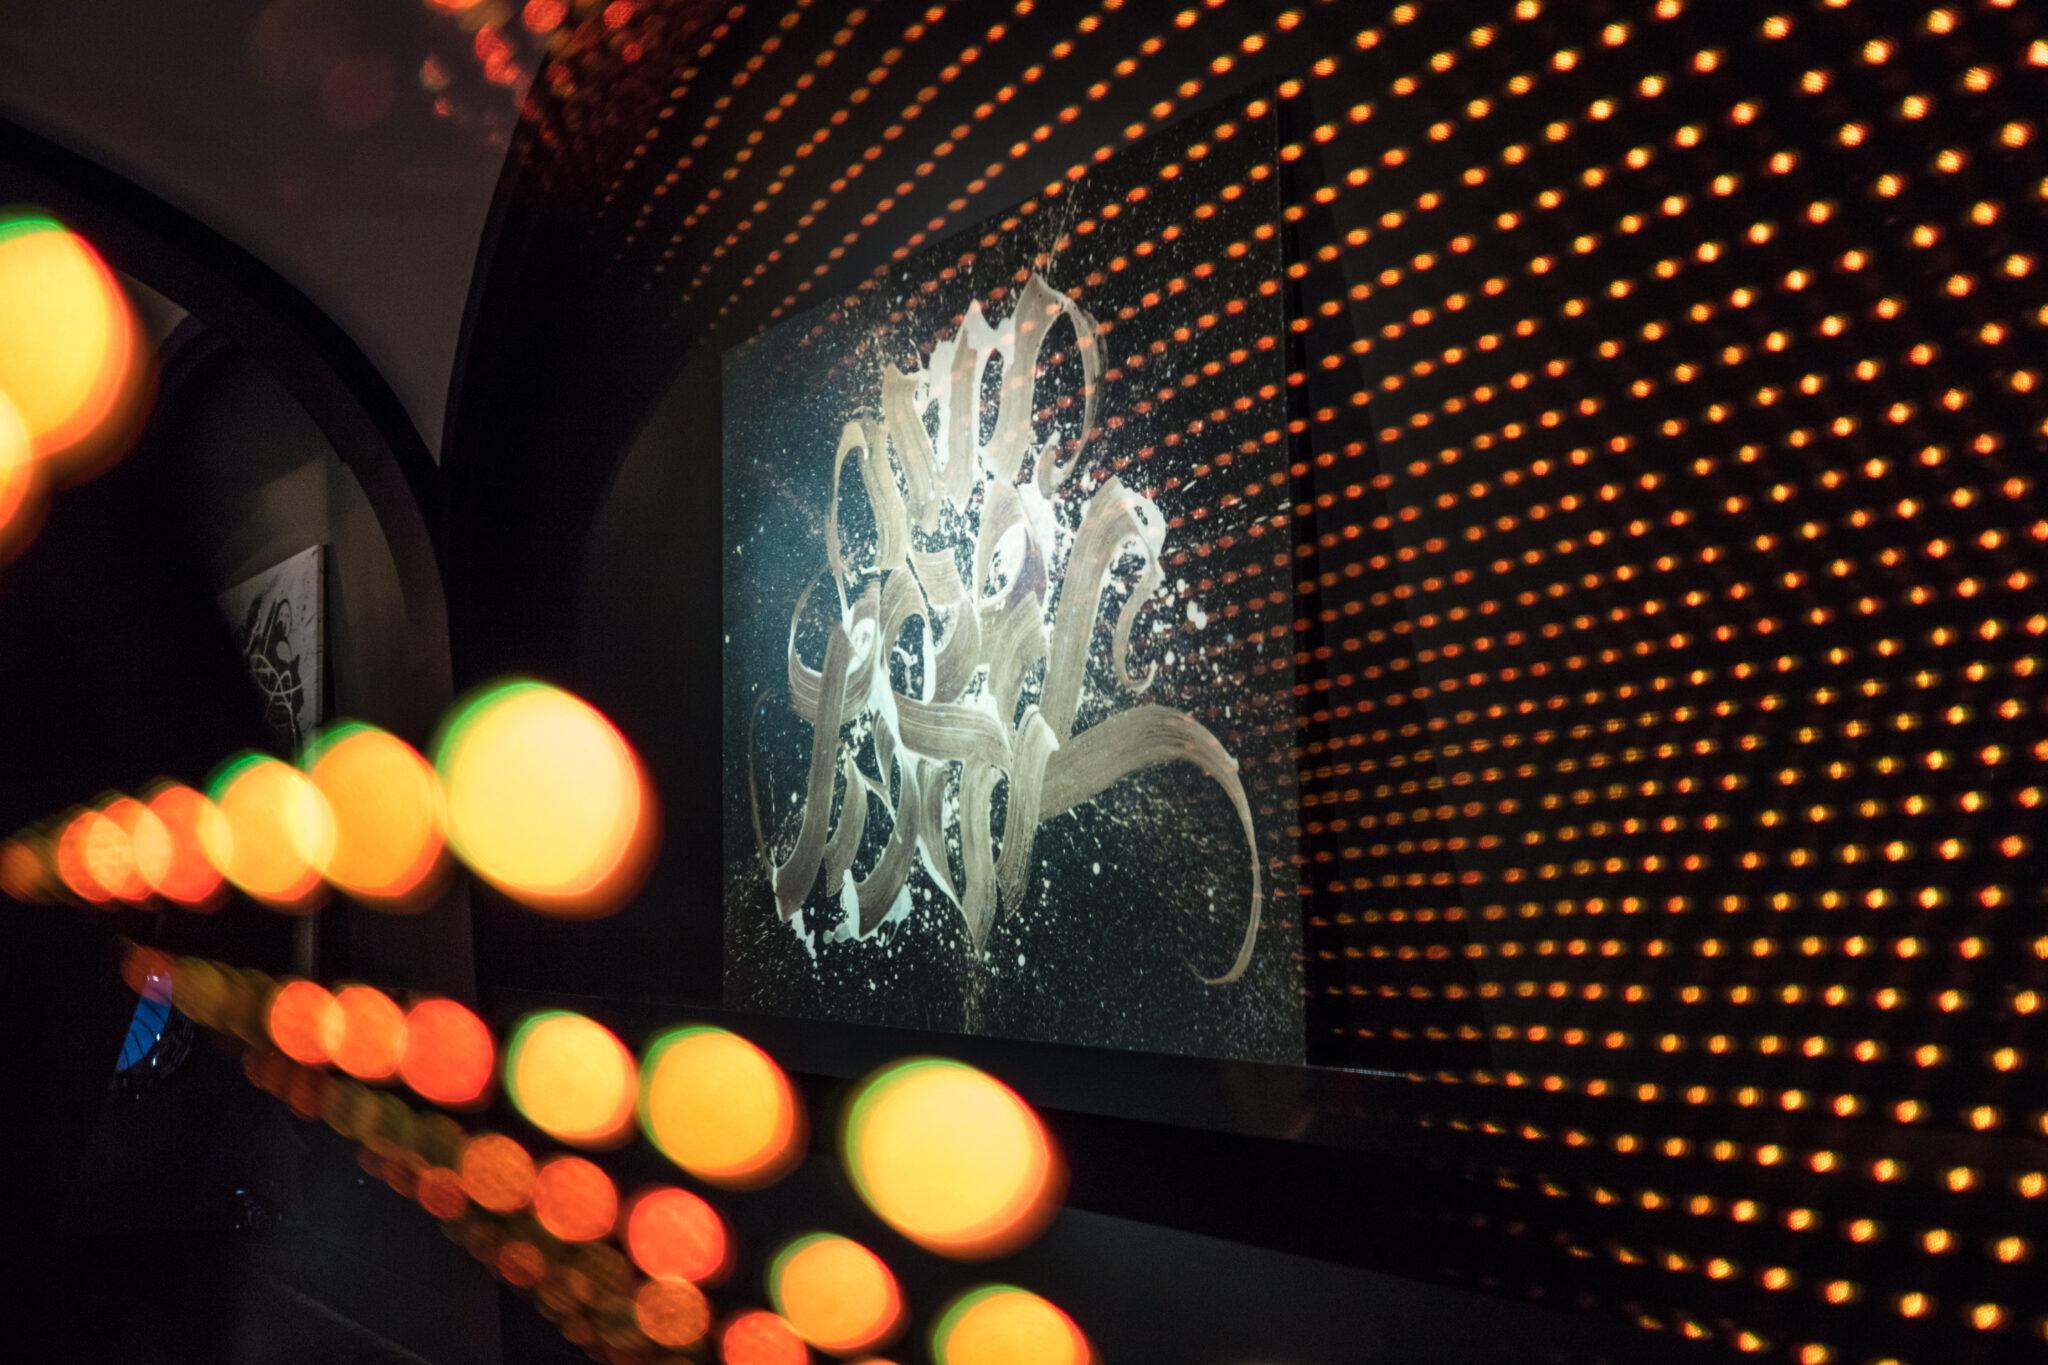 audrey-hatchikian-gallery-momentum-expo-2018